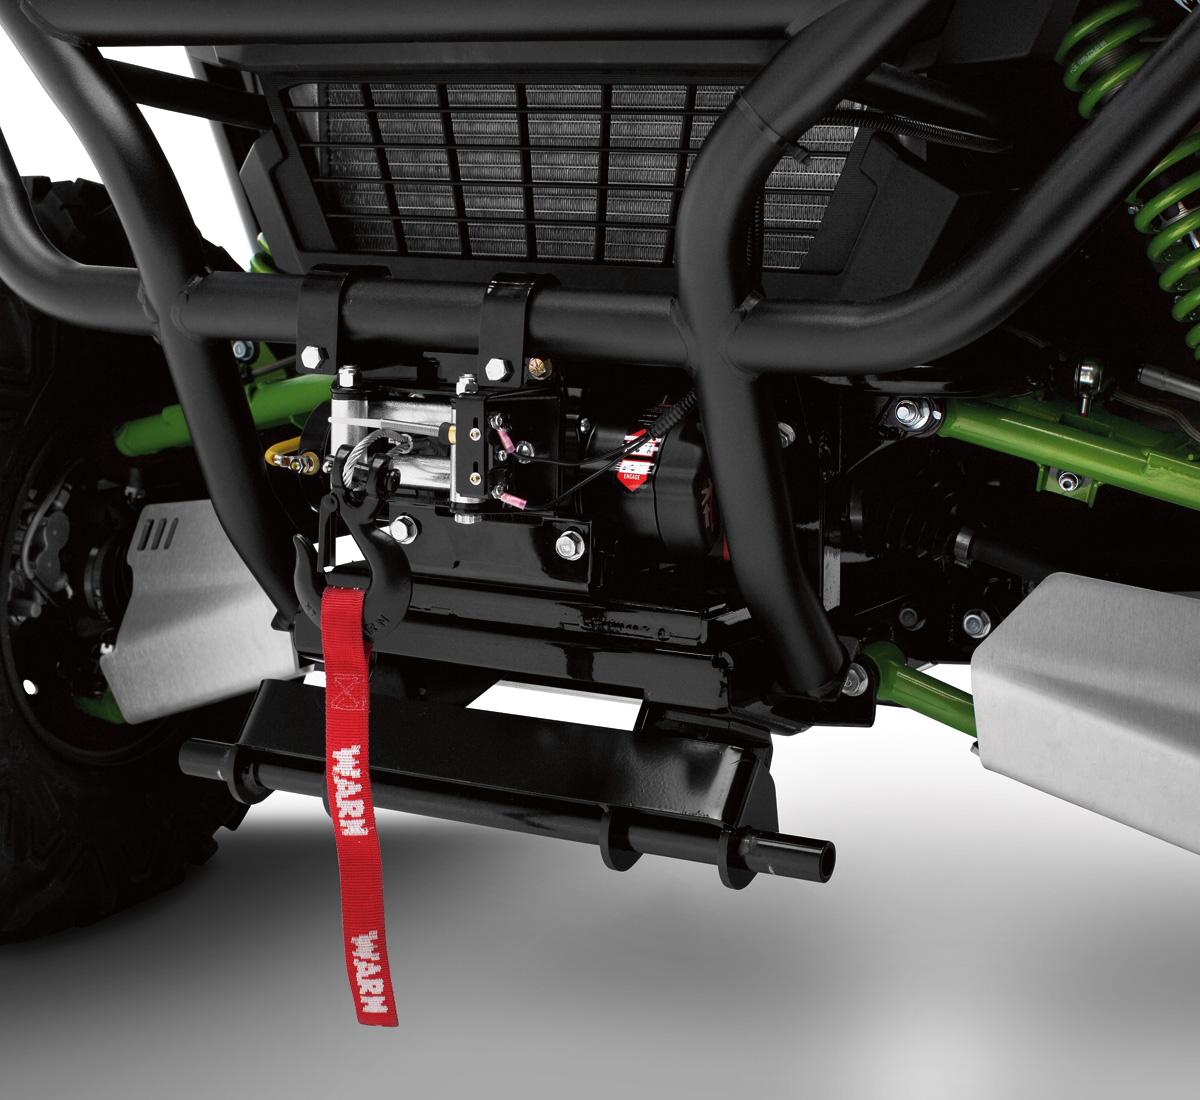 medium resolution of kawasaki teryx winch wiring enthusiast wiring diagrams u2022 kawasaki teryx 4 seater kawasaki teryx winch